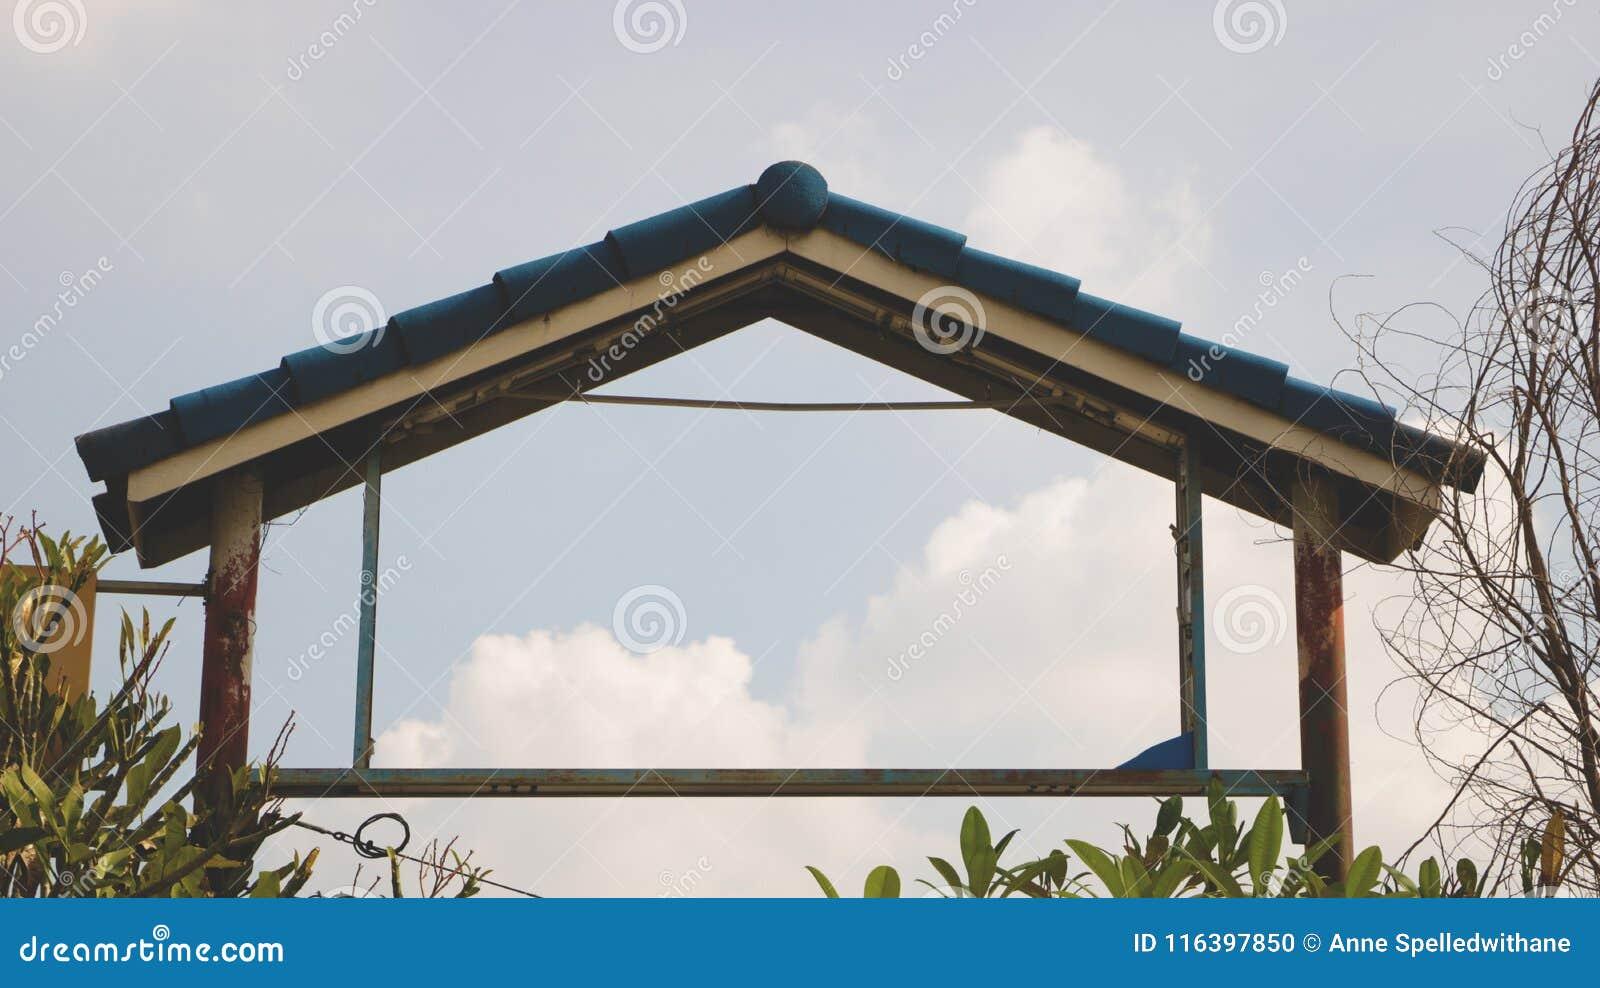 Vintage Rusty Metal Gate With Blue Tile Roof Stock Photo Image Of Door Leaf 116397850